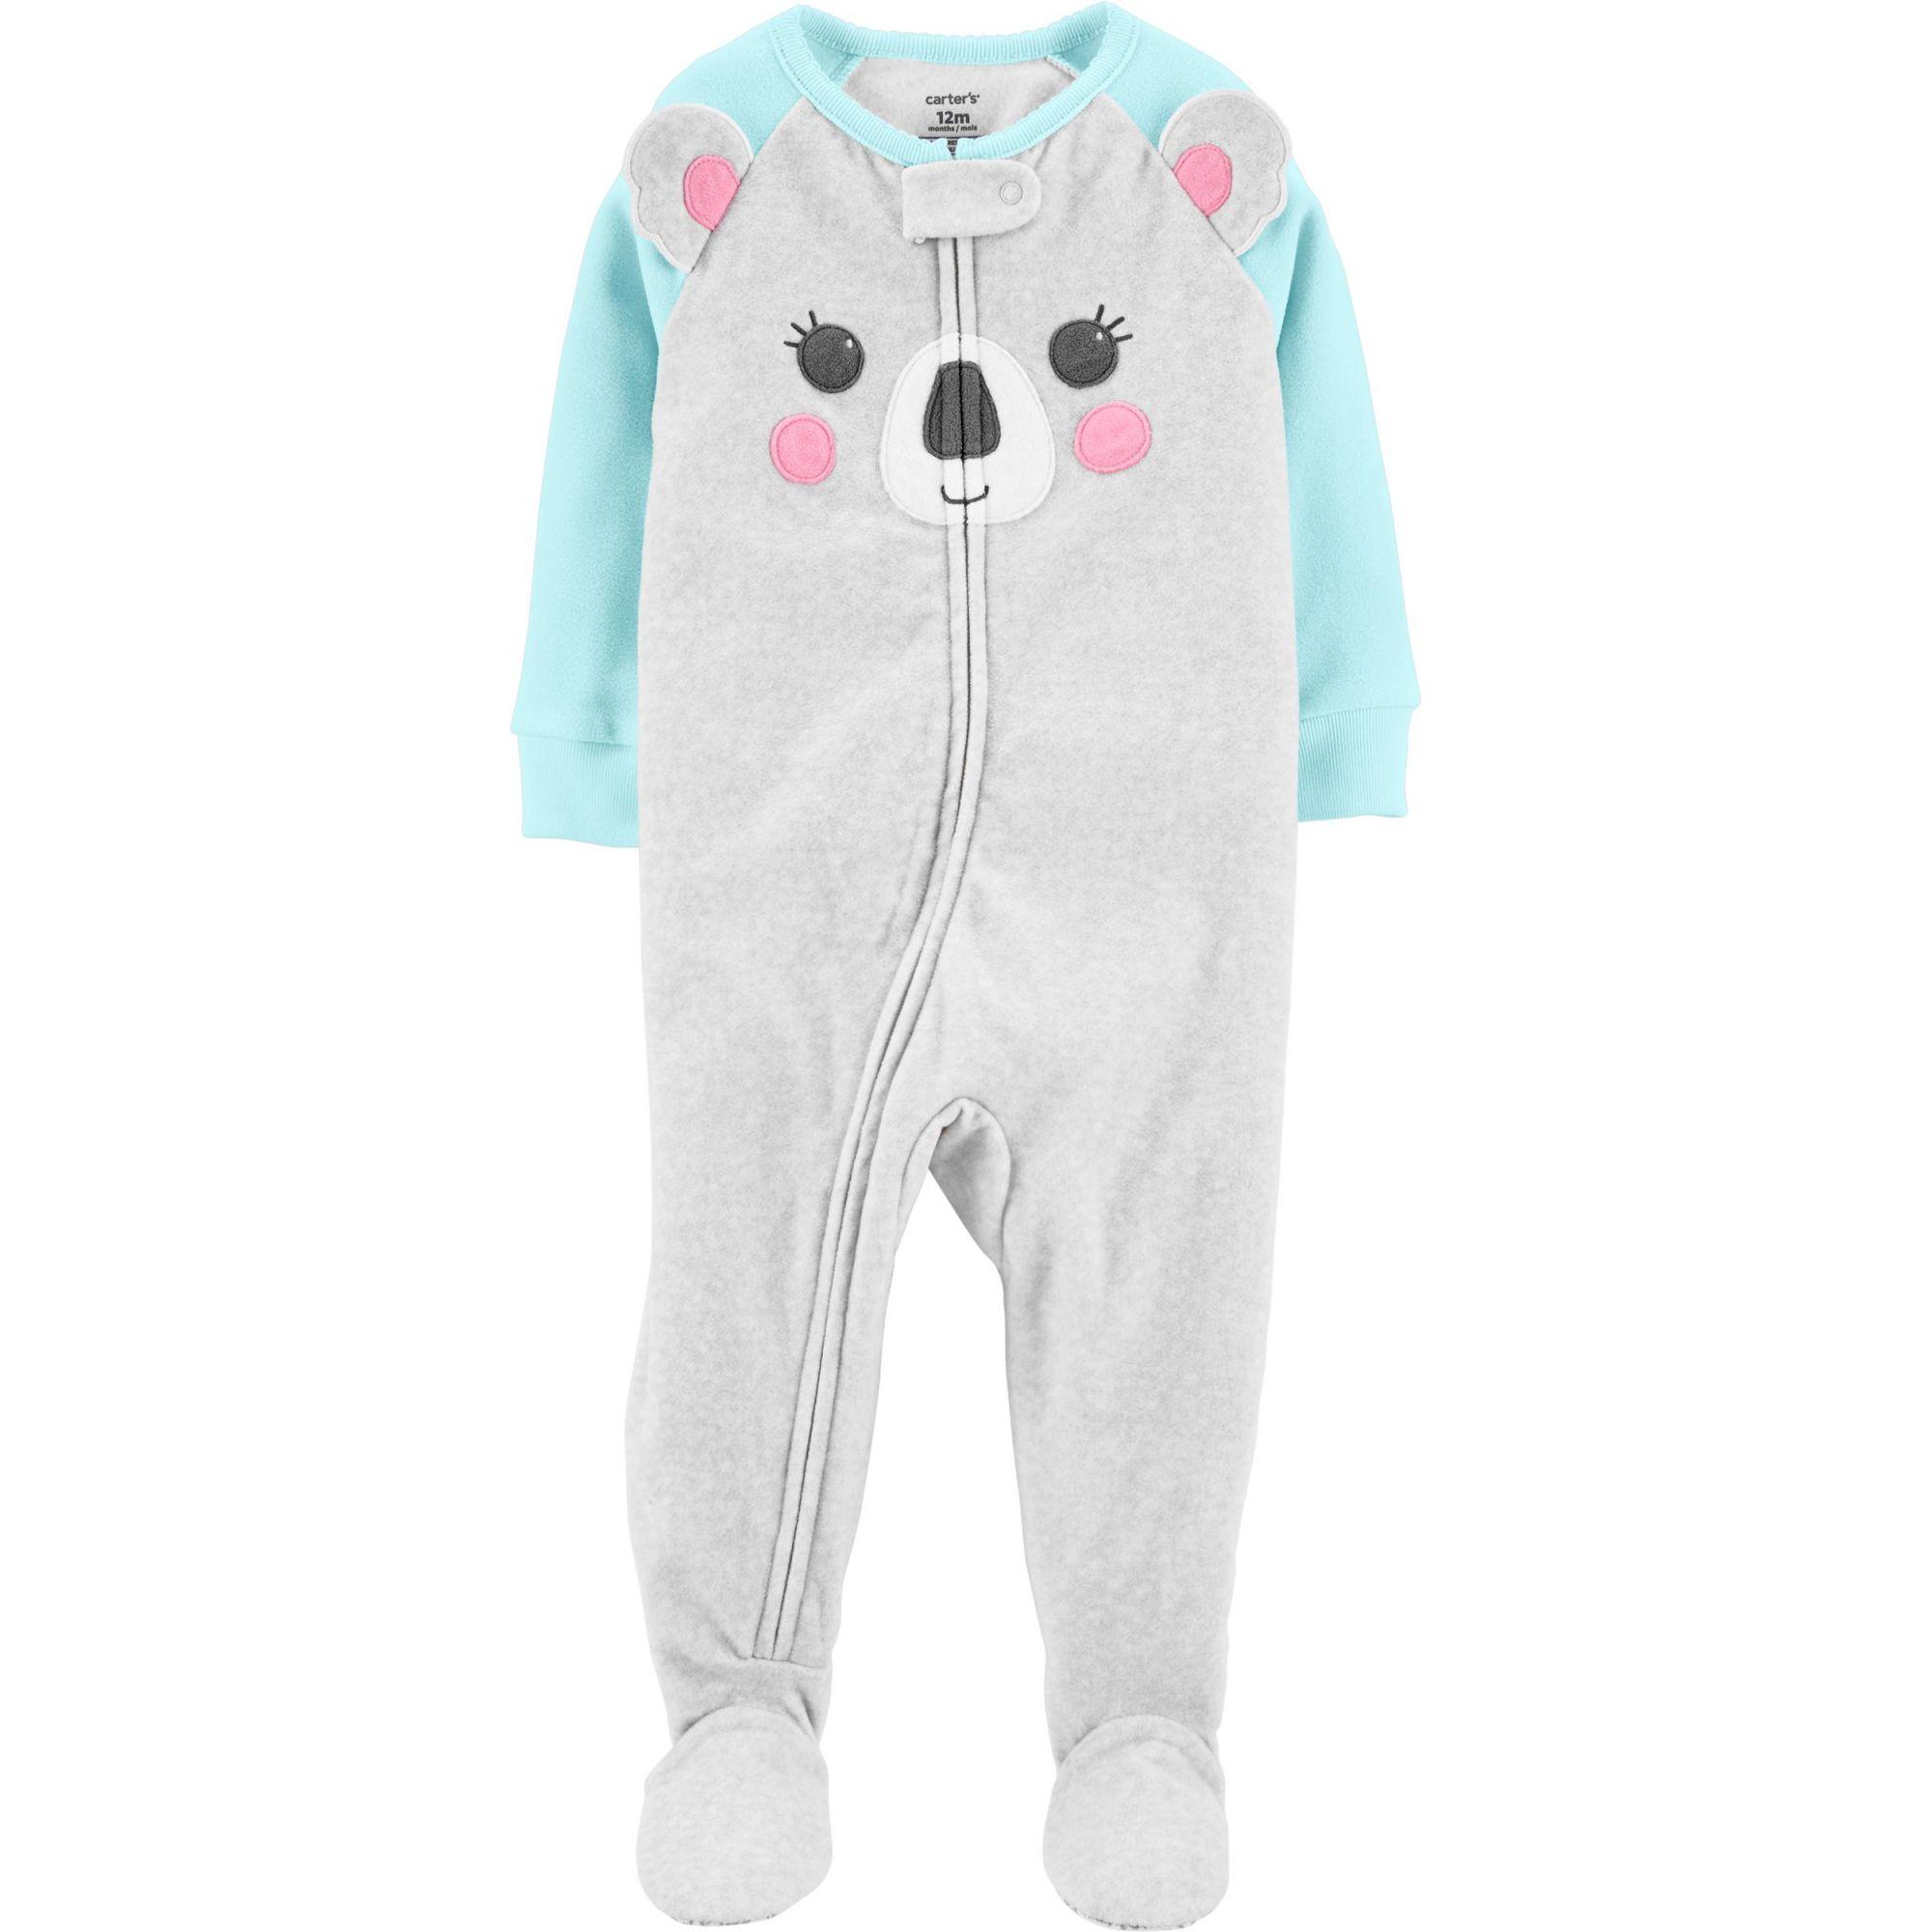 Pijama macacão de plush cinza coala - Carters  - Kaiuru Kids